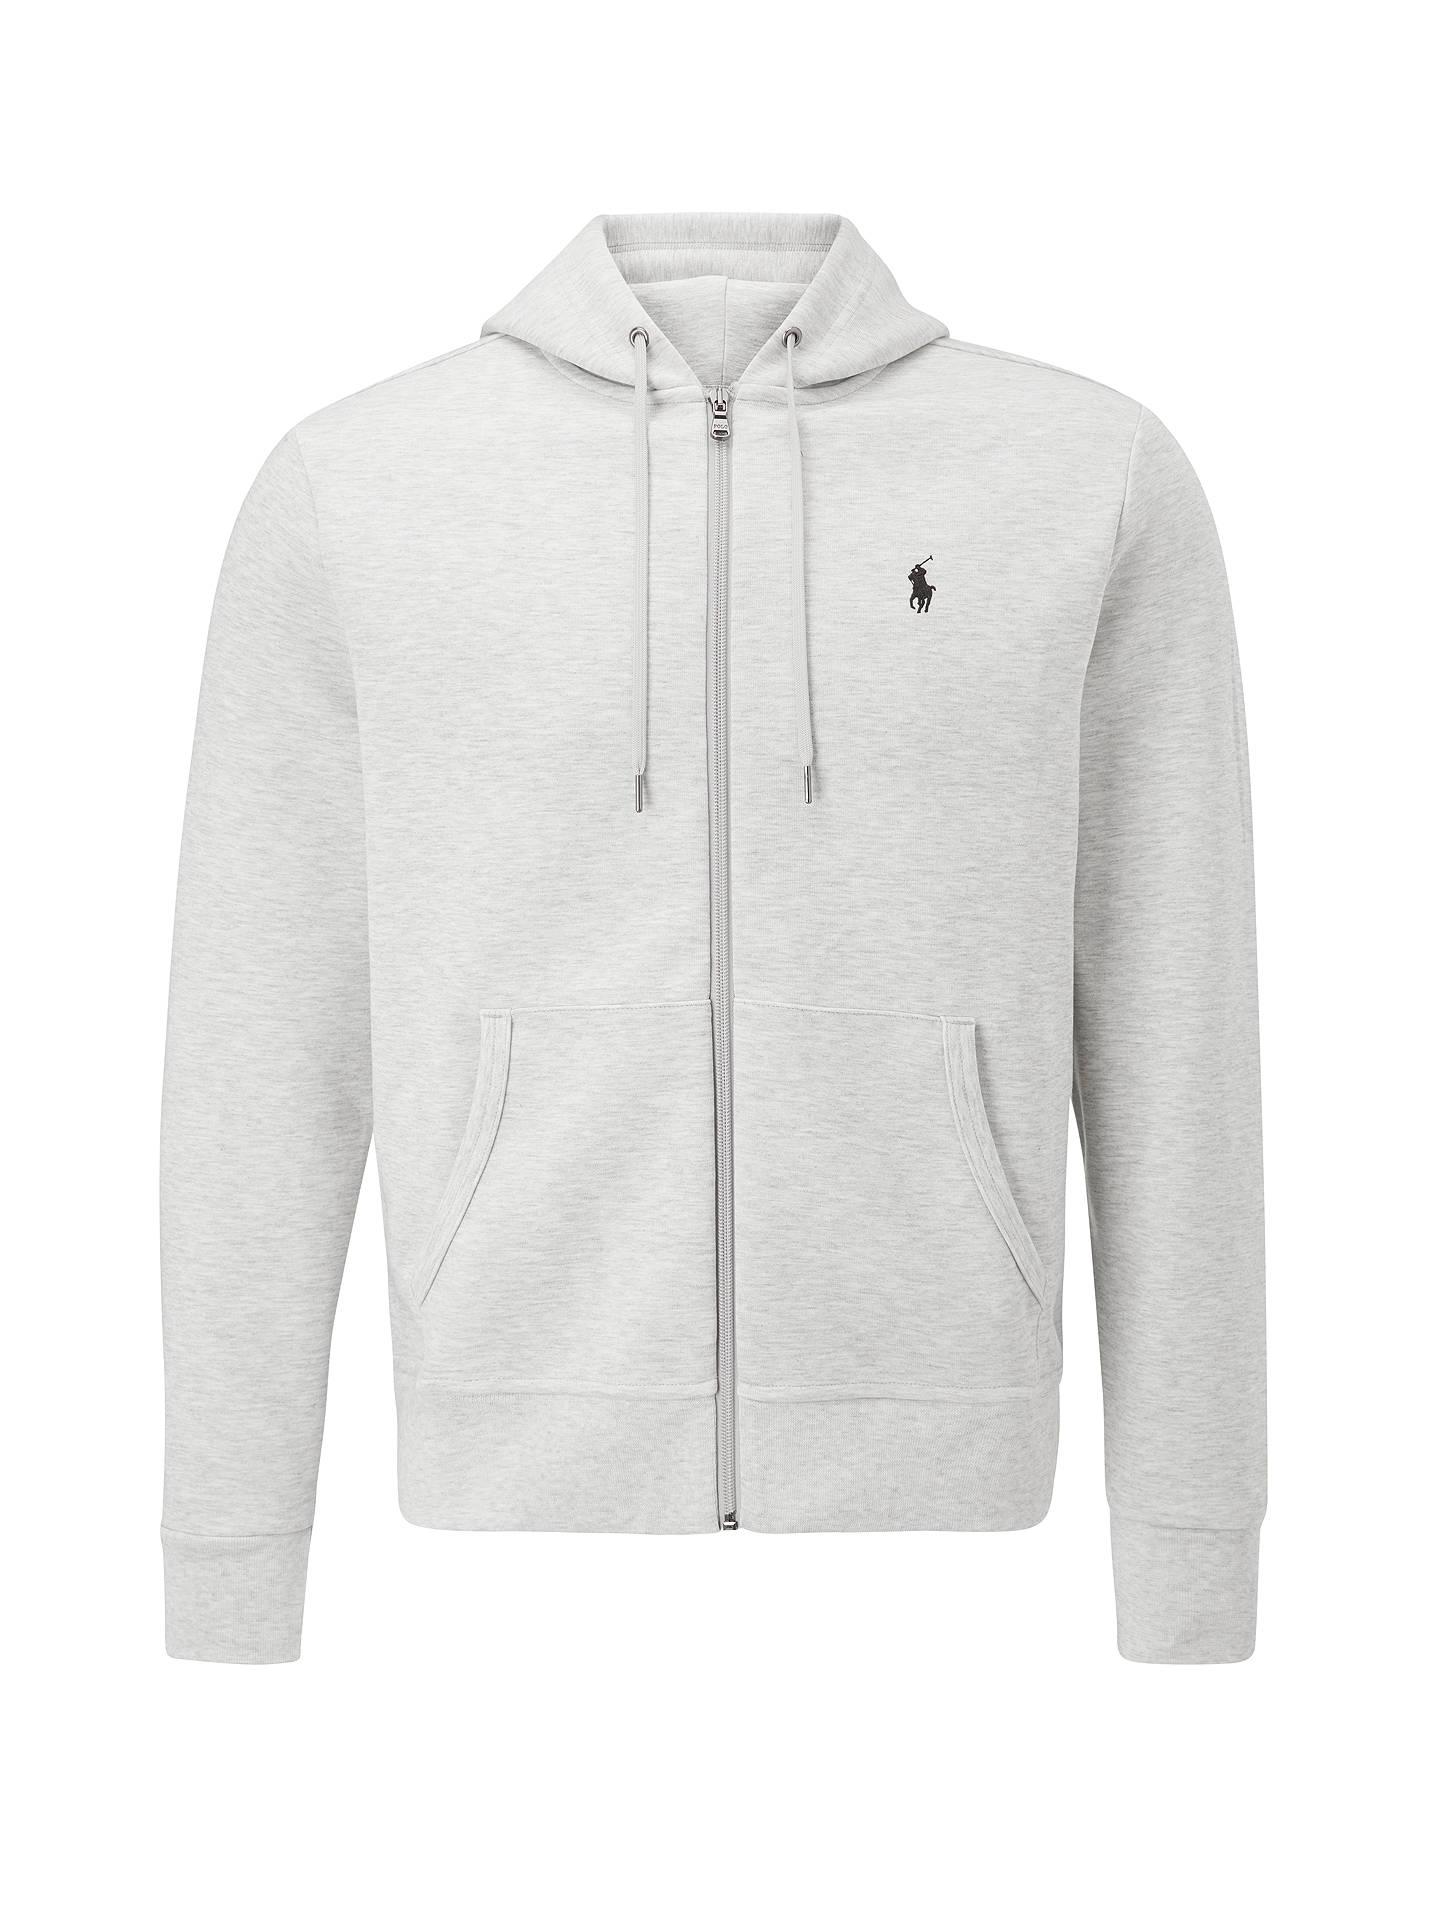 2d4cd80a72906 ... Buy Polo Ralph Lauren Long Sleeve Full Zip Hoodie